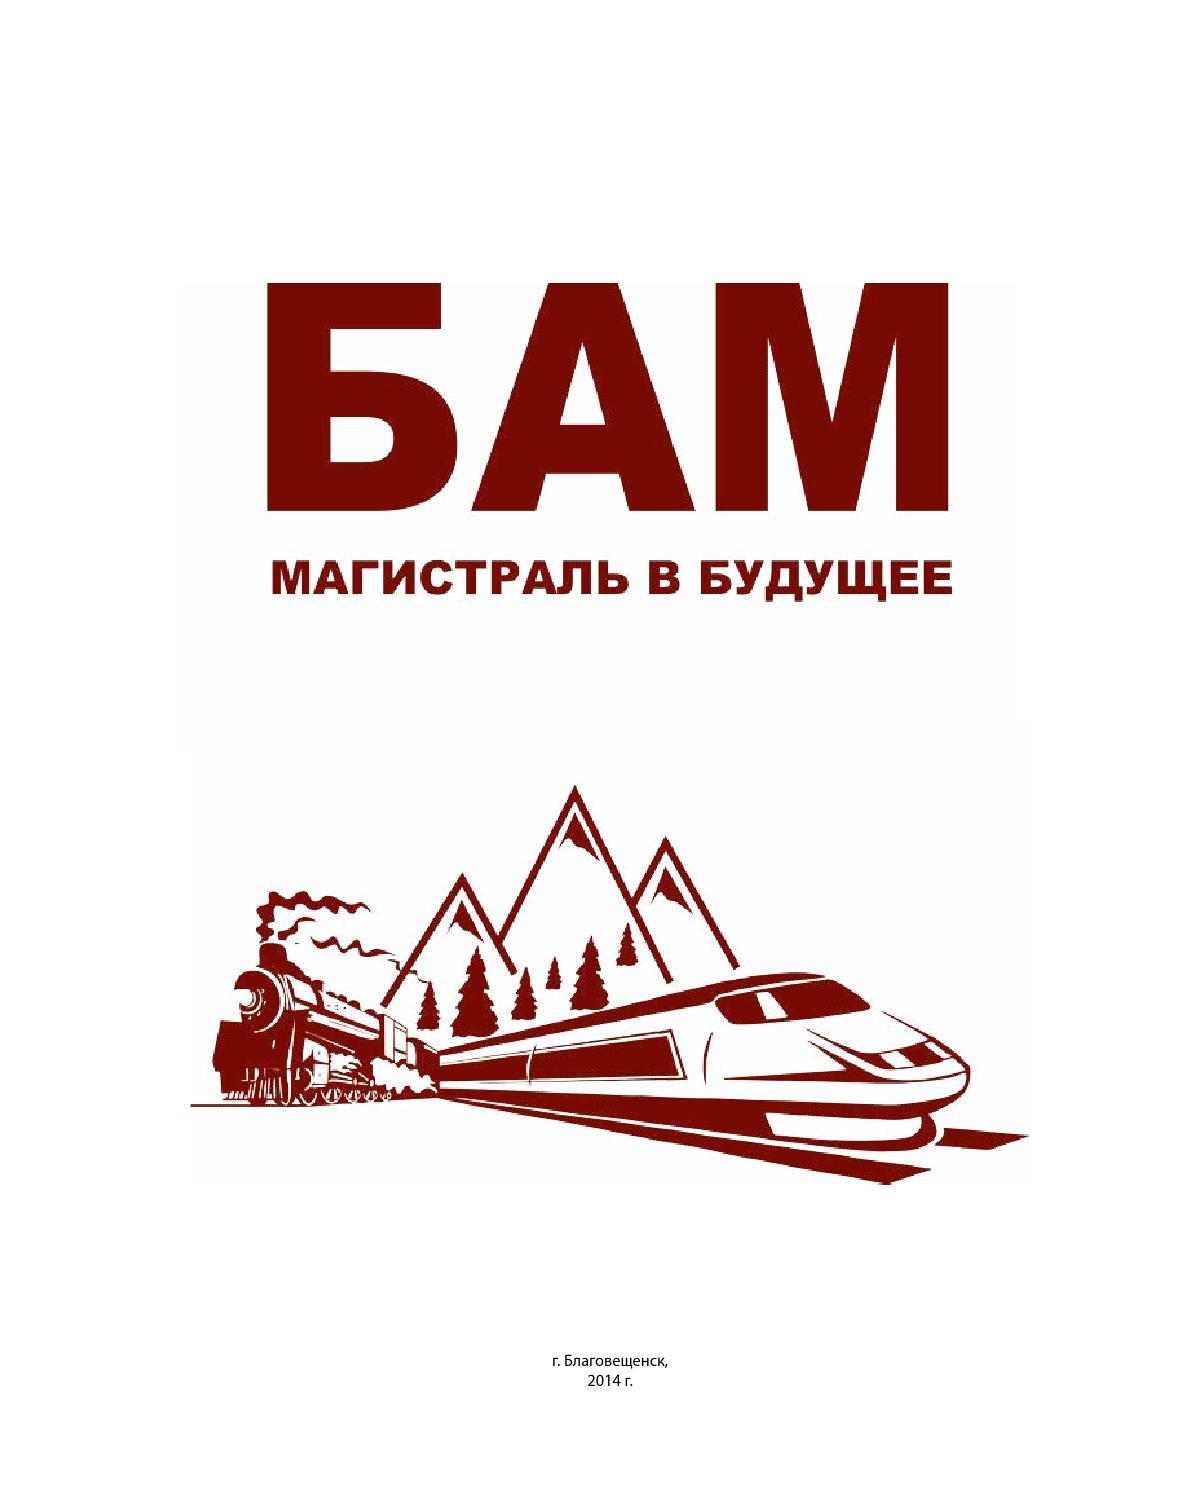 бам карта железной дороги со станциями